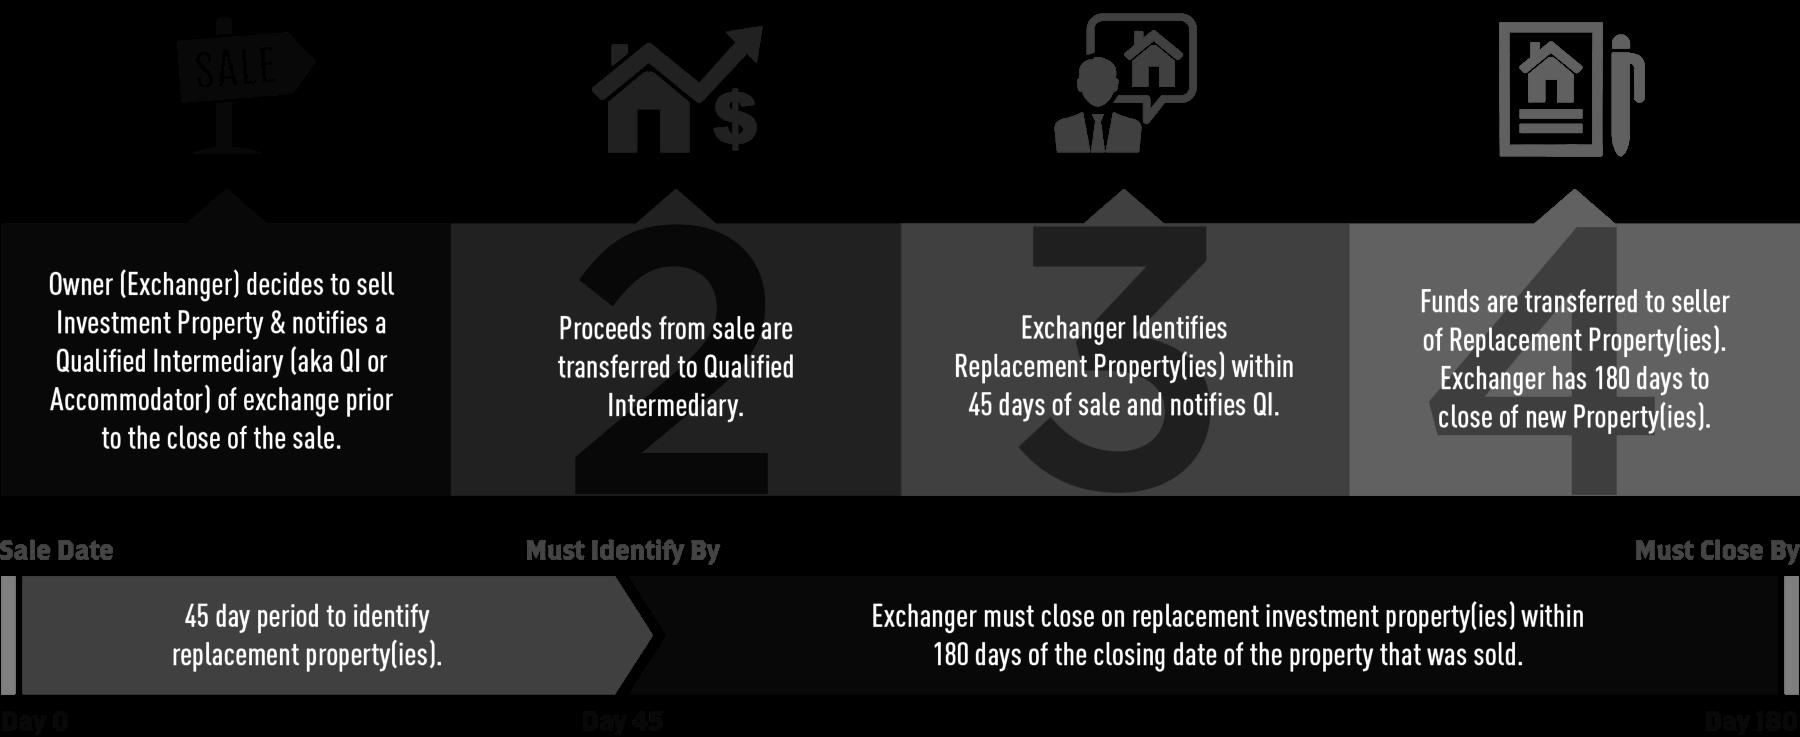 1031 Exchange Rules -Tax Exchange ditangguhkan